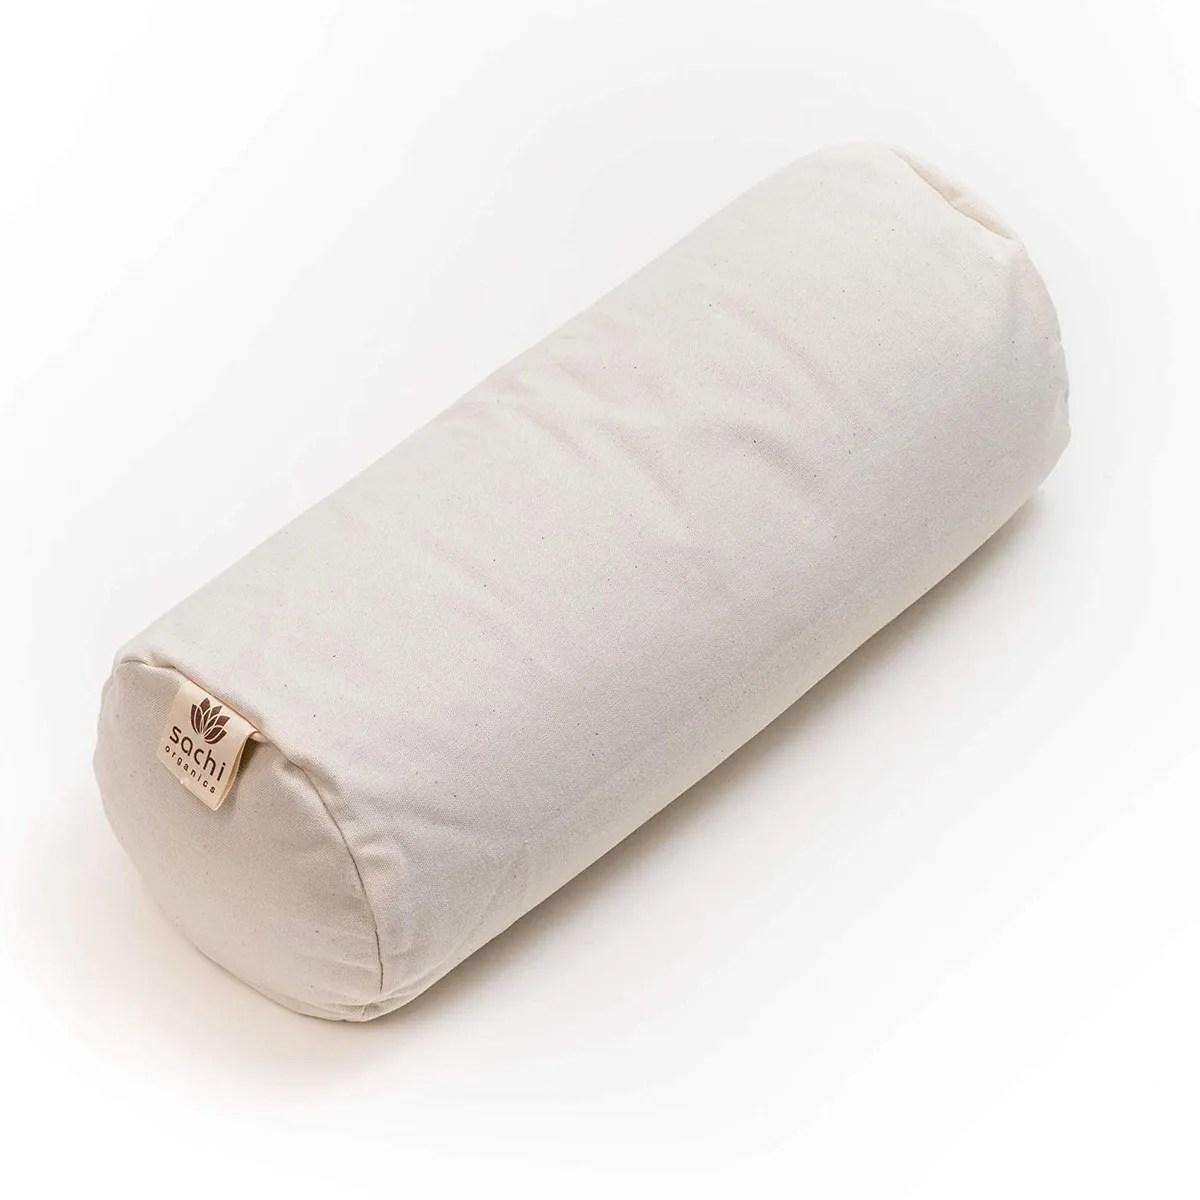 8 Best Pillows For Neck Pain 2020 The Strategist New York Magazine